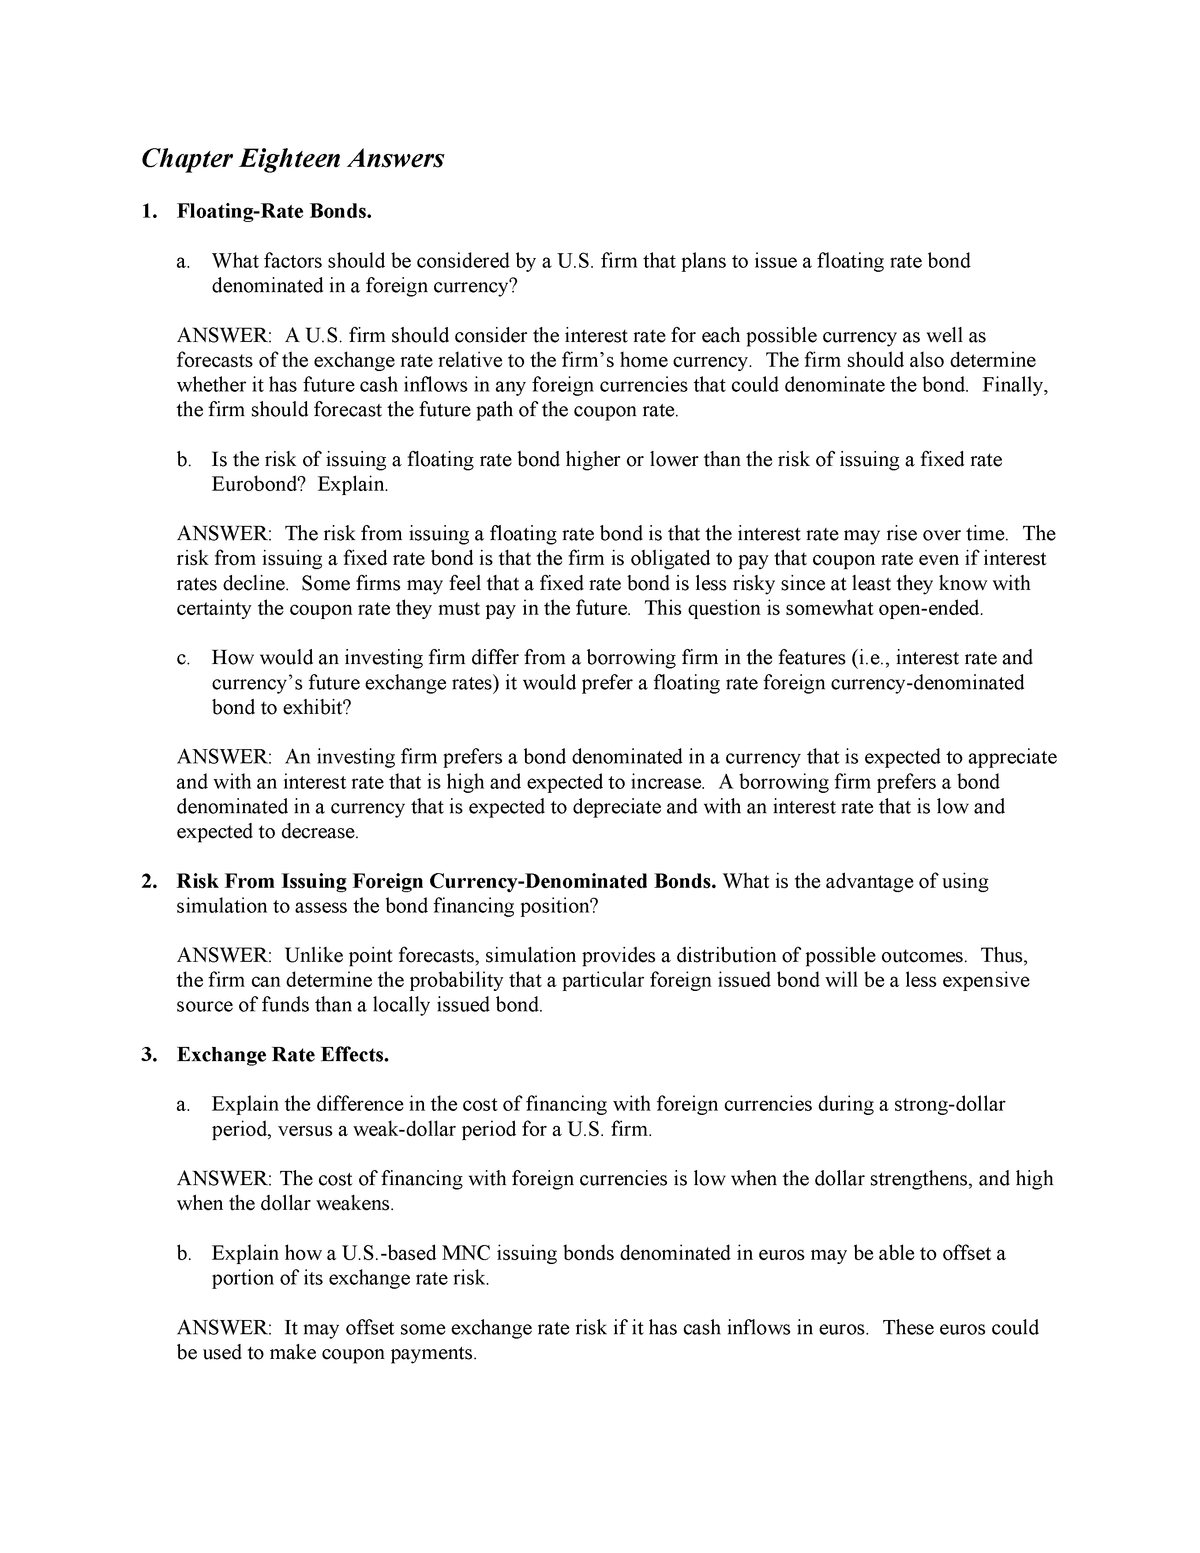 Chapter 18 - Solution manual International Financial Management